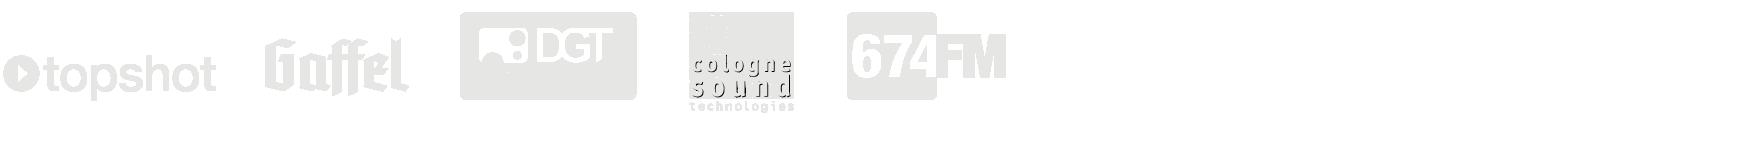 KUR19–Web–Footer–Sponsoring–2–2.png